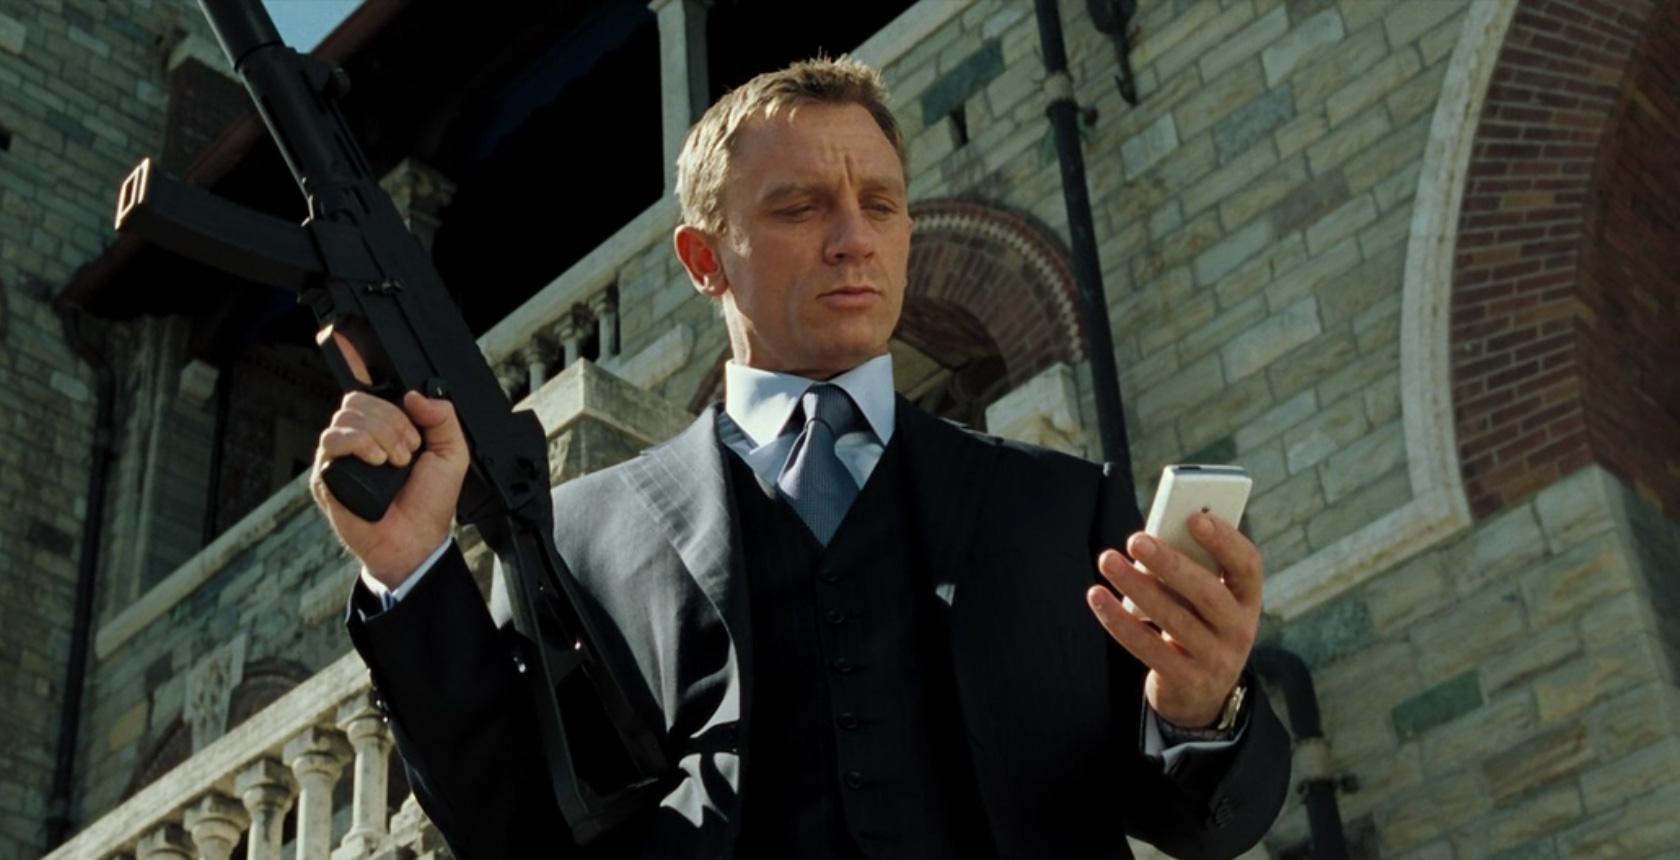 Daniel Craig in 2006's Casino Royale